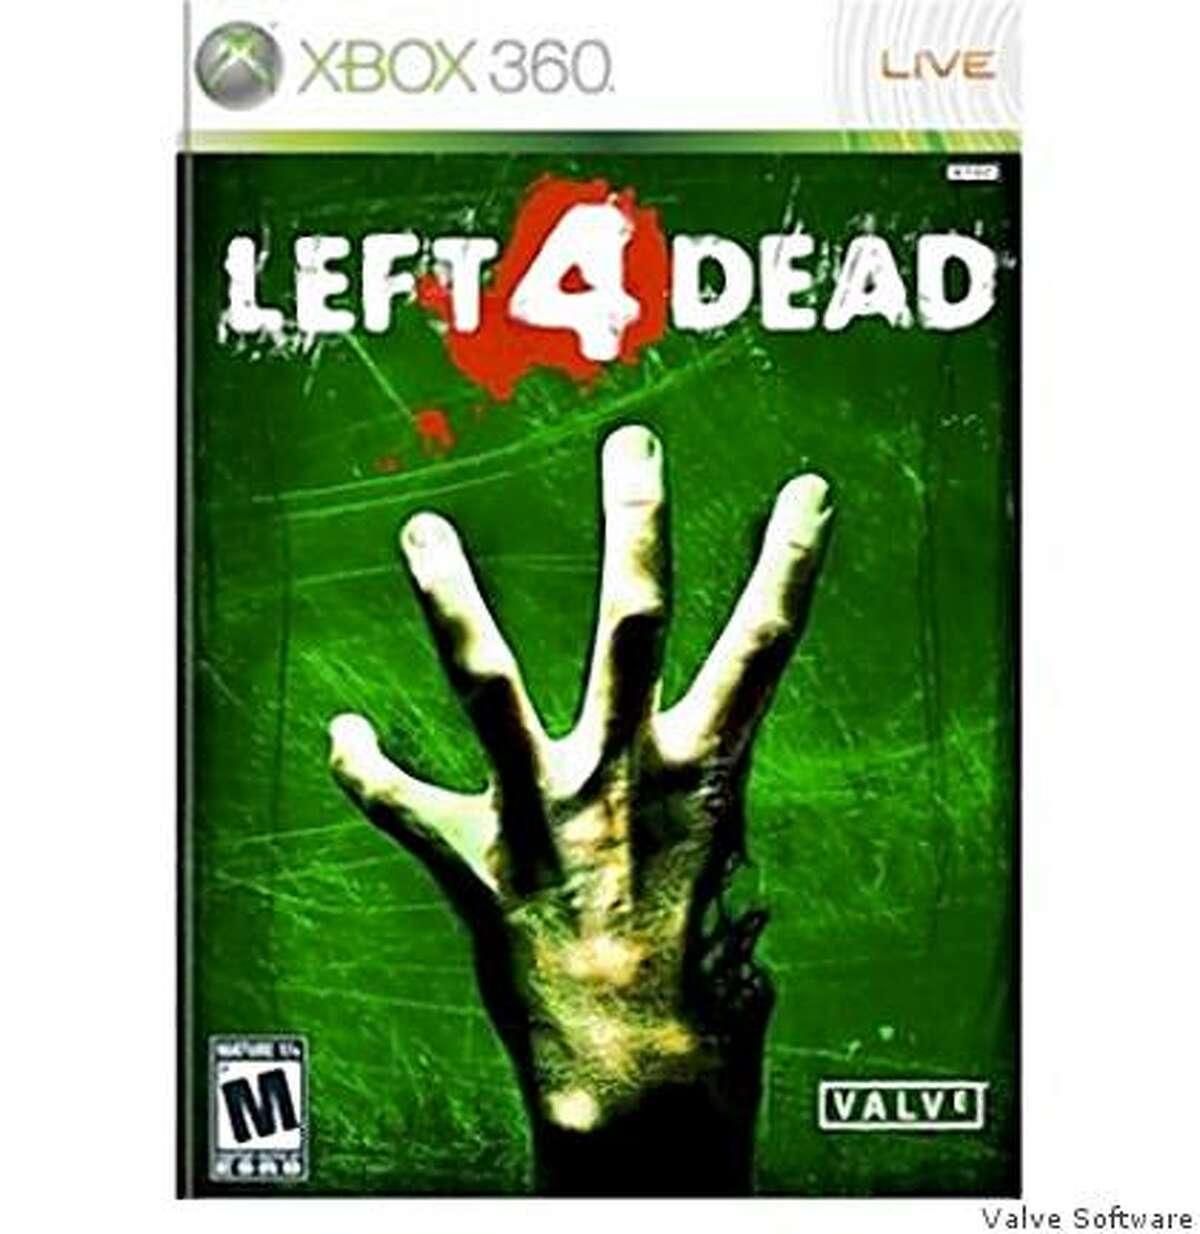 Left 4 Dead. Publisher: Valve Software/ Electronic Arts. Developer: Valve Software. $49.99-59.99. PC and XBOX 360.